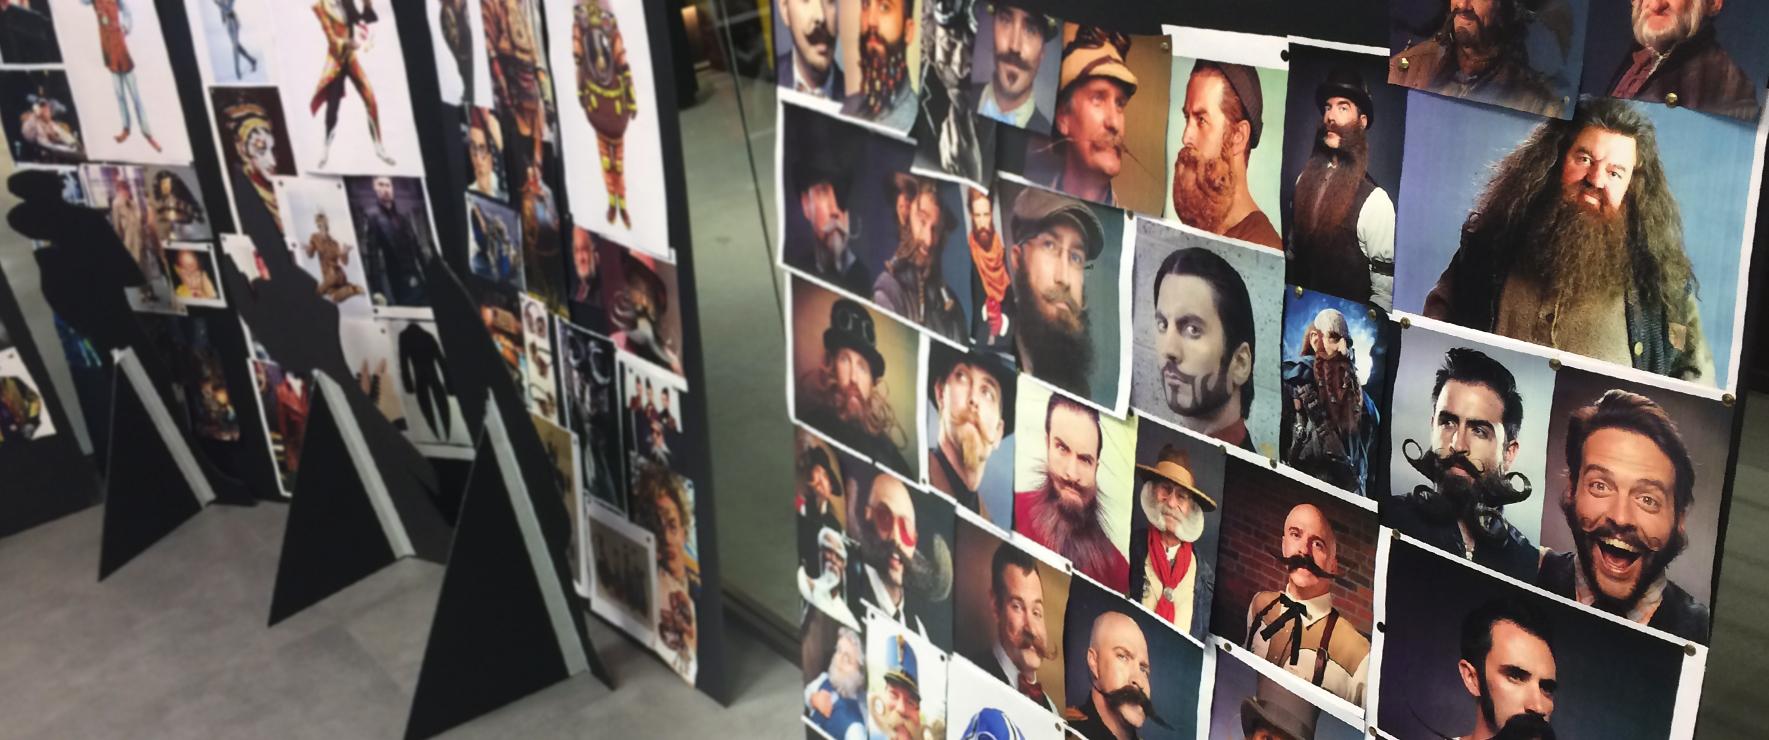 mural_bigode.jpg